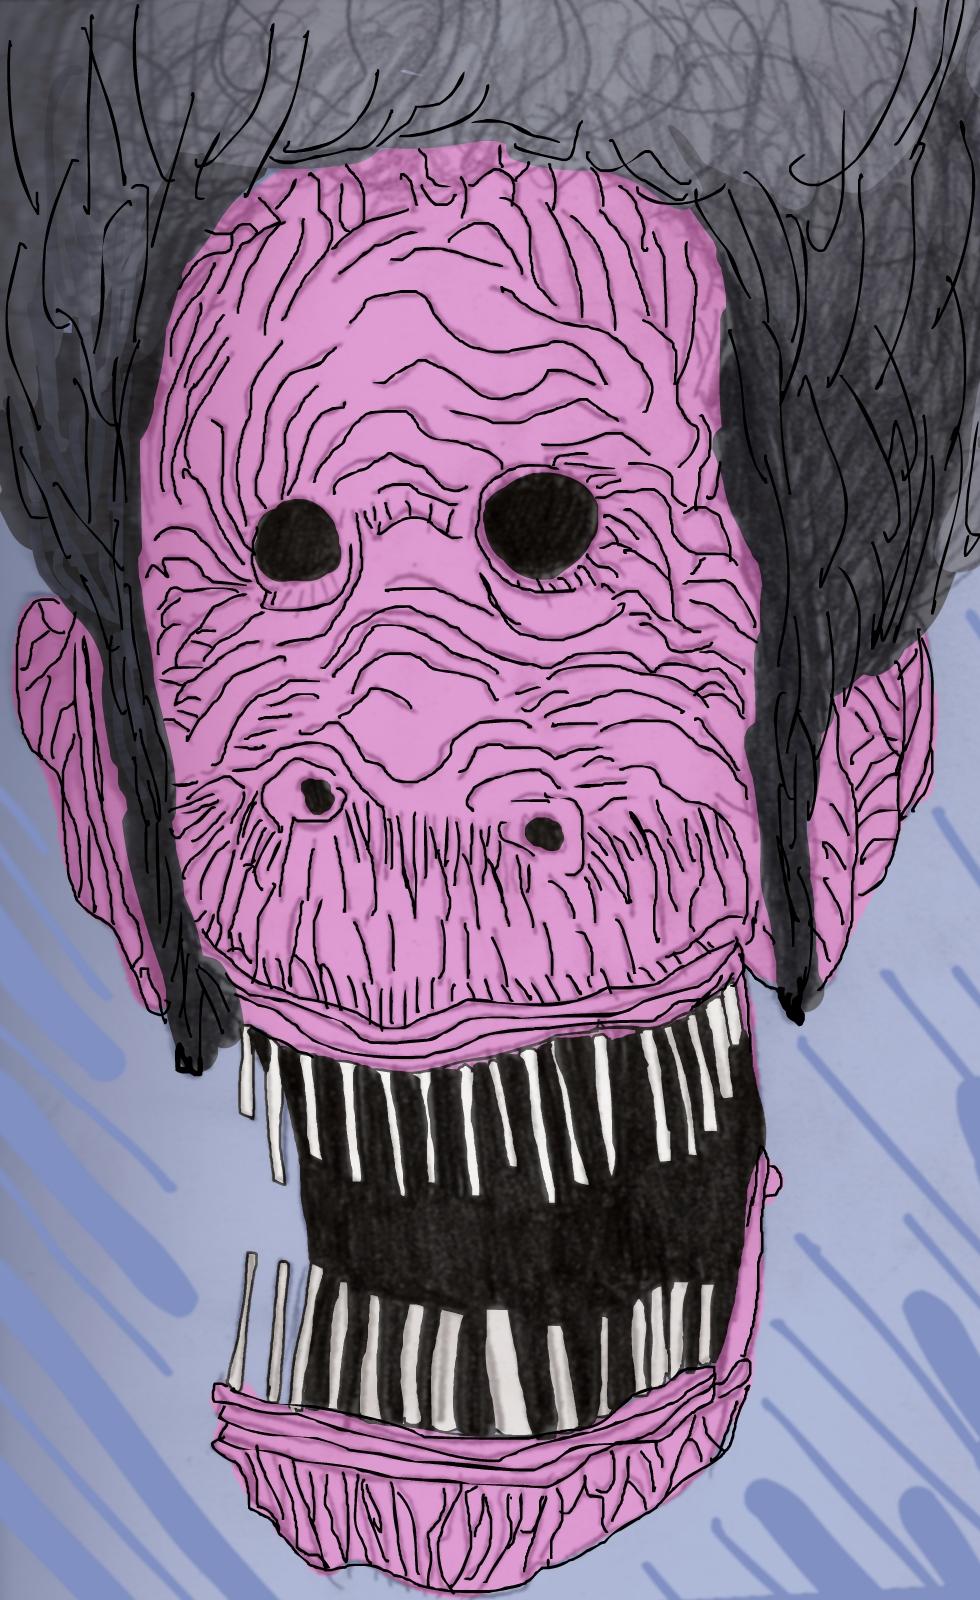 Wrinkle Man